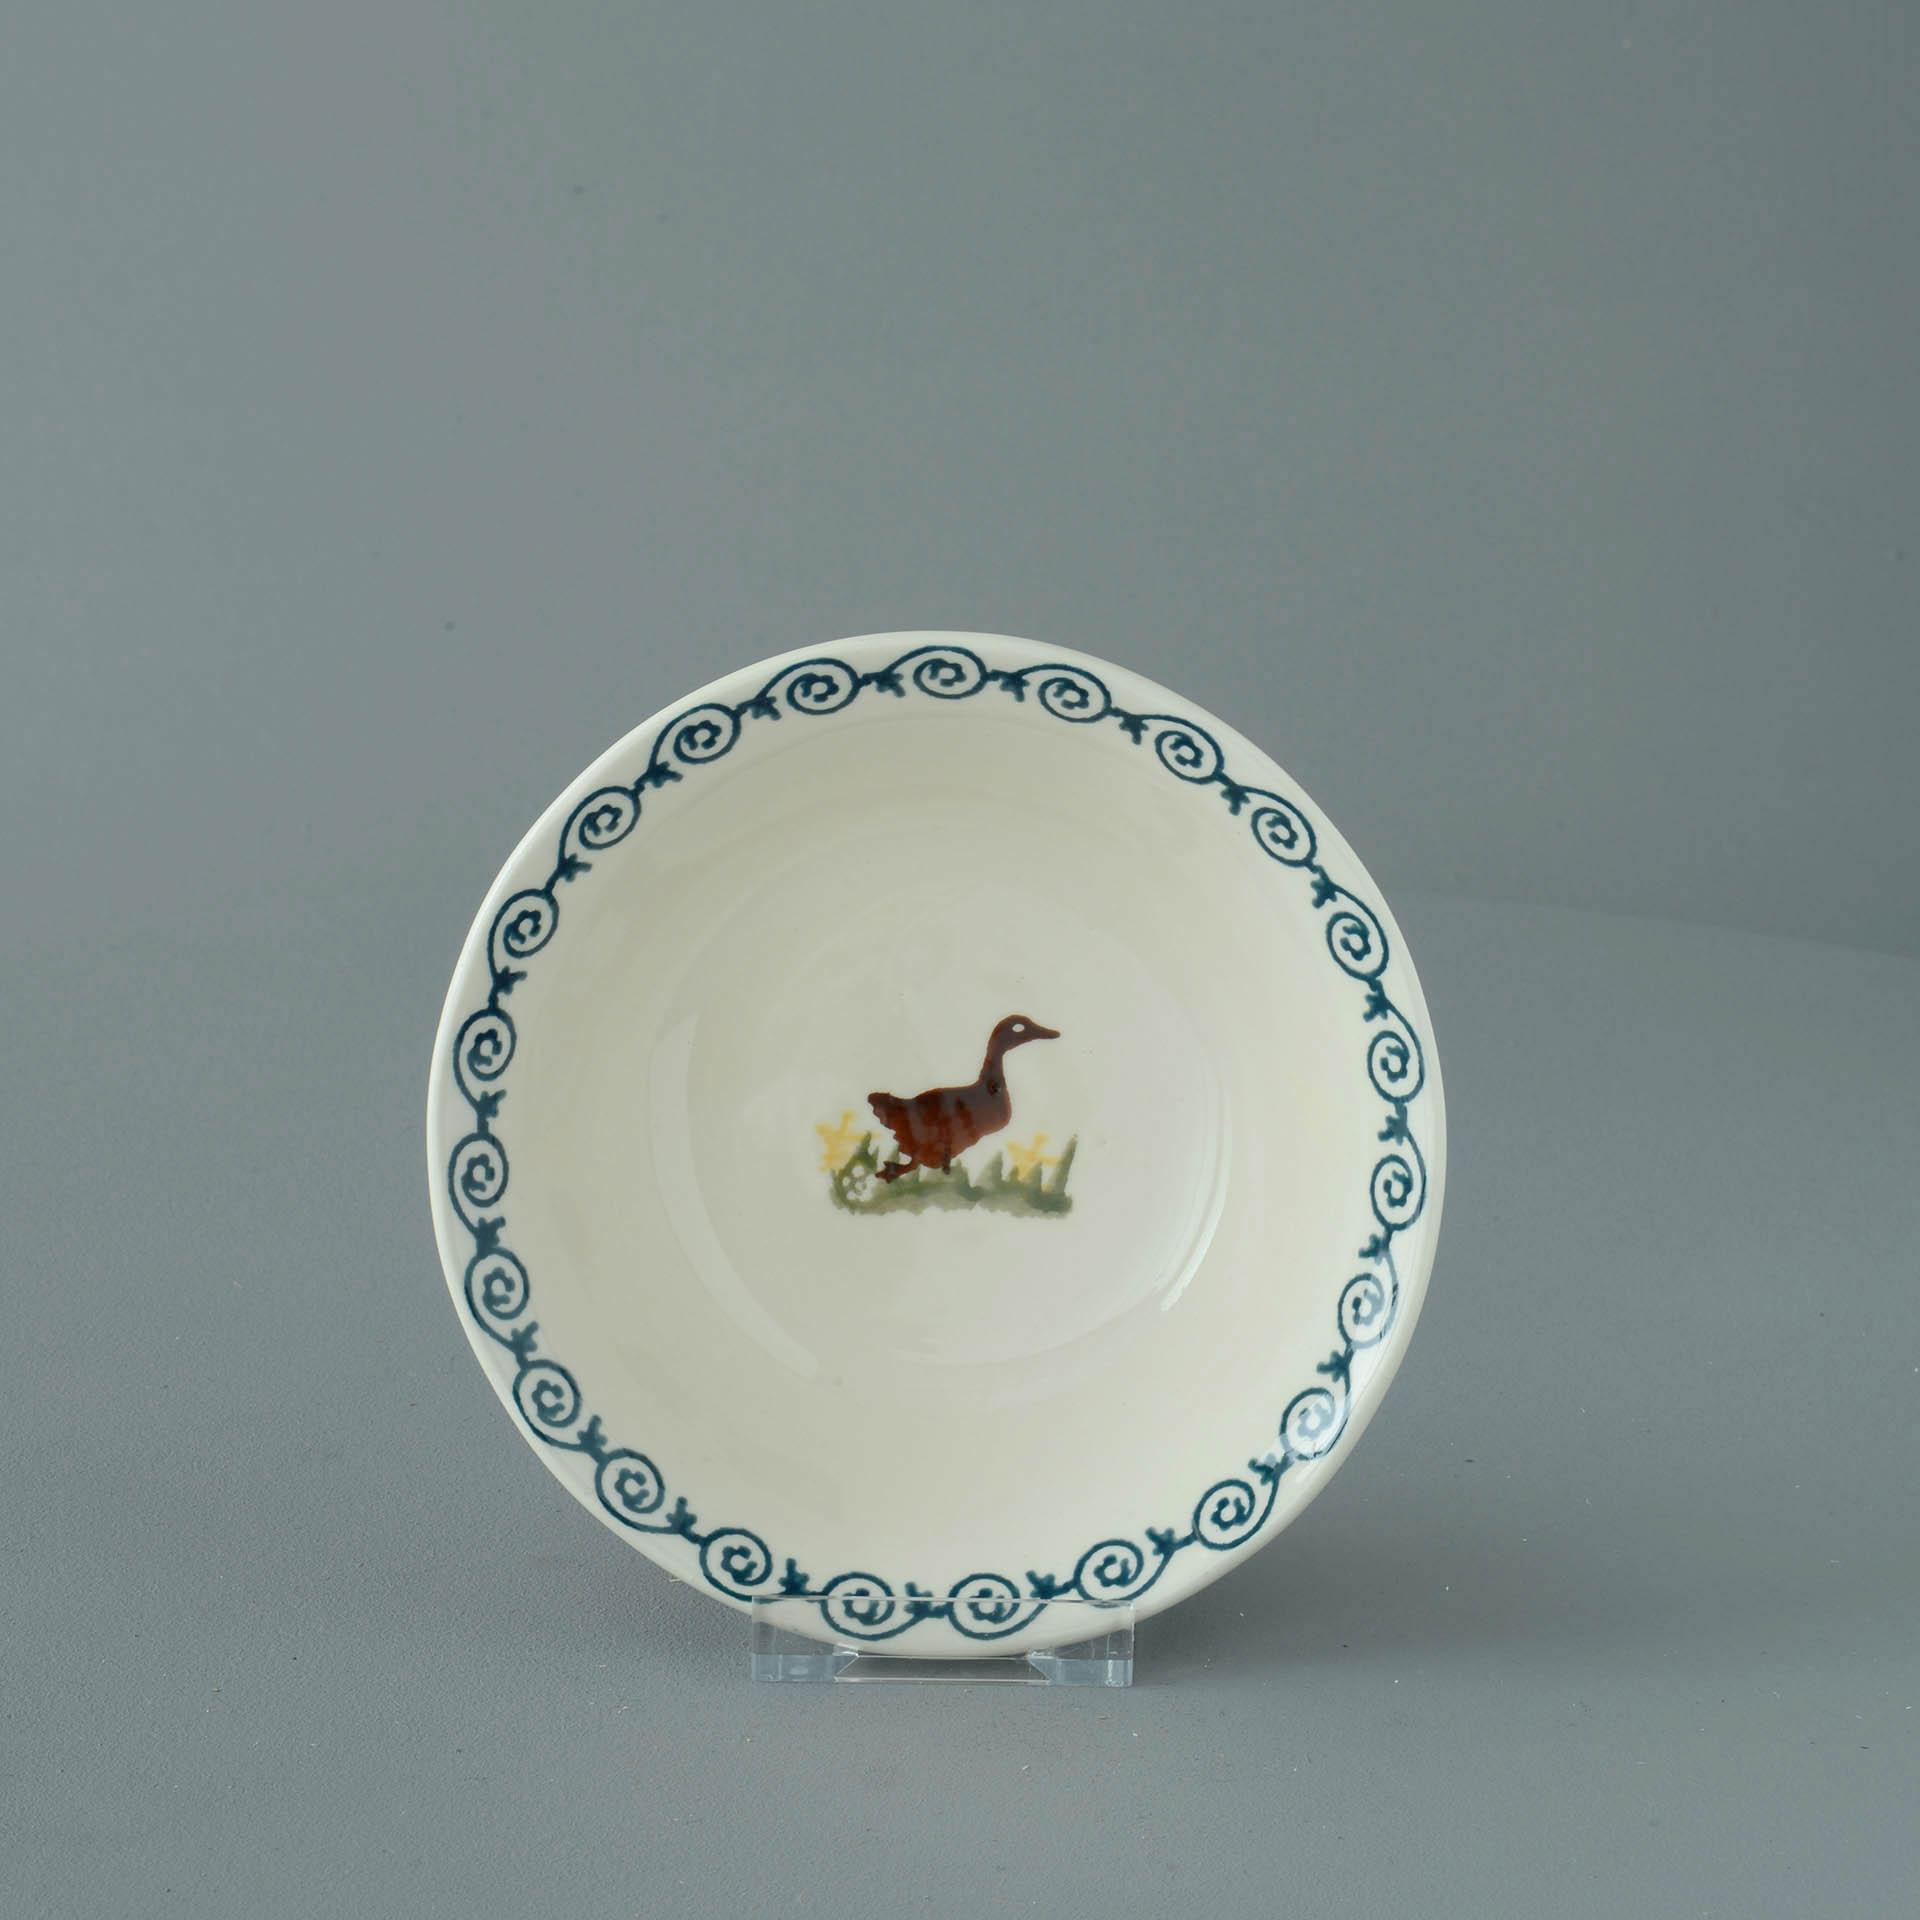 Ducks Baby Bowl 4.5 x 15cm